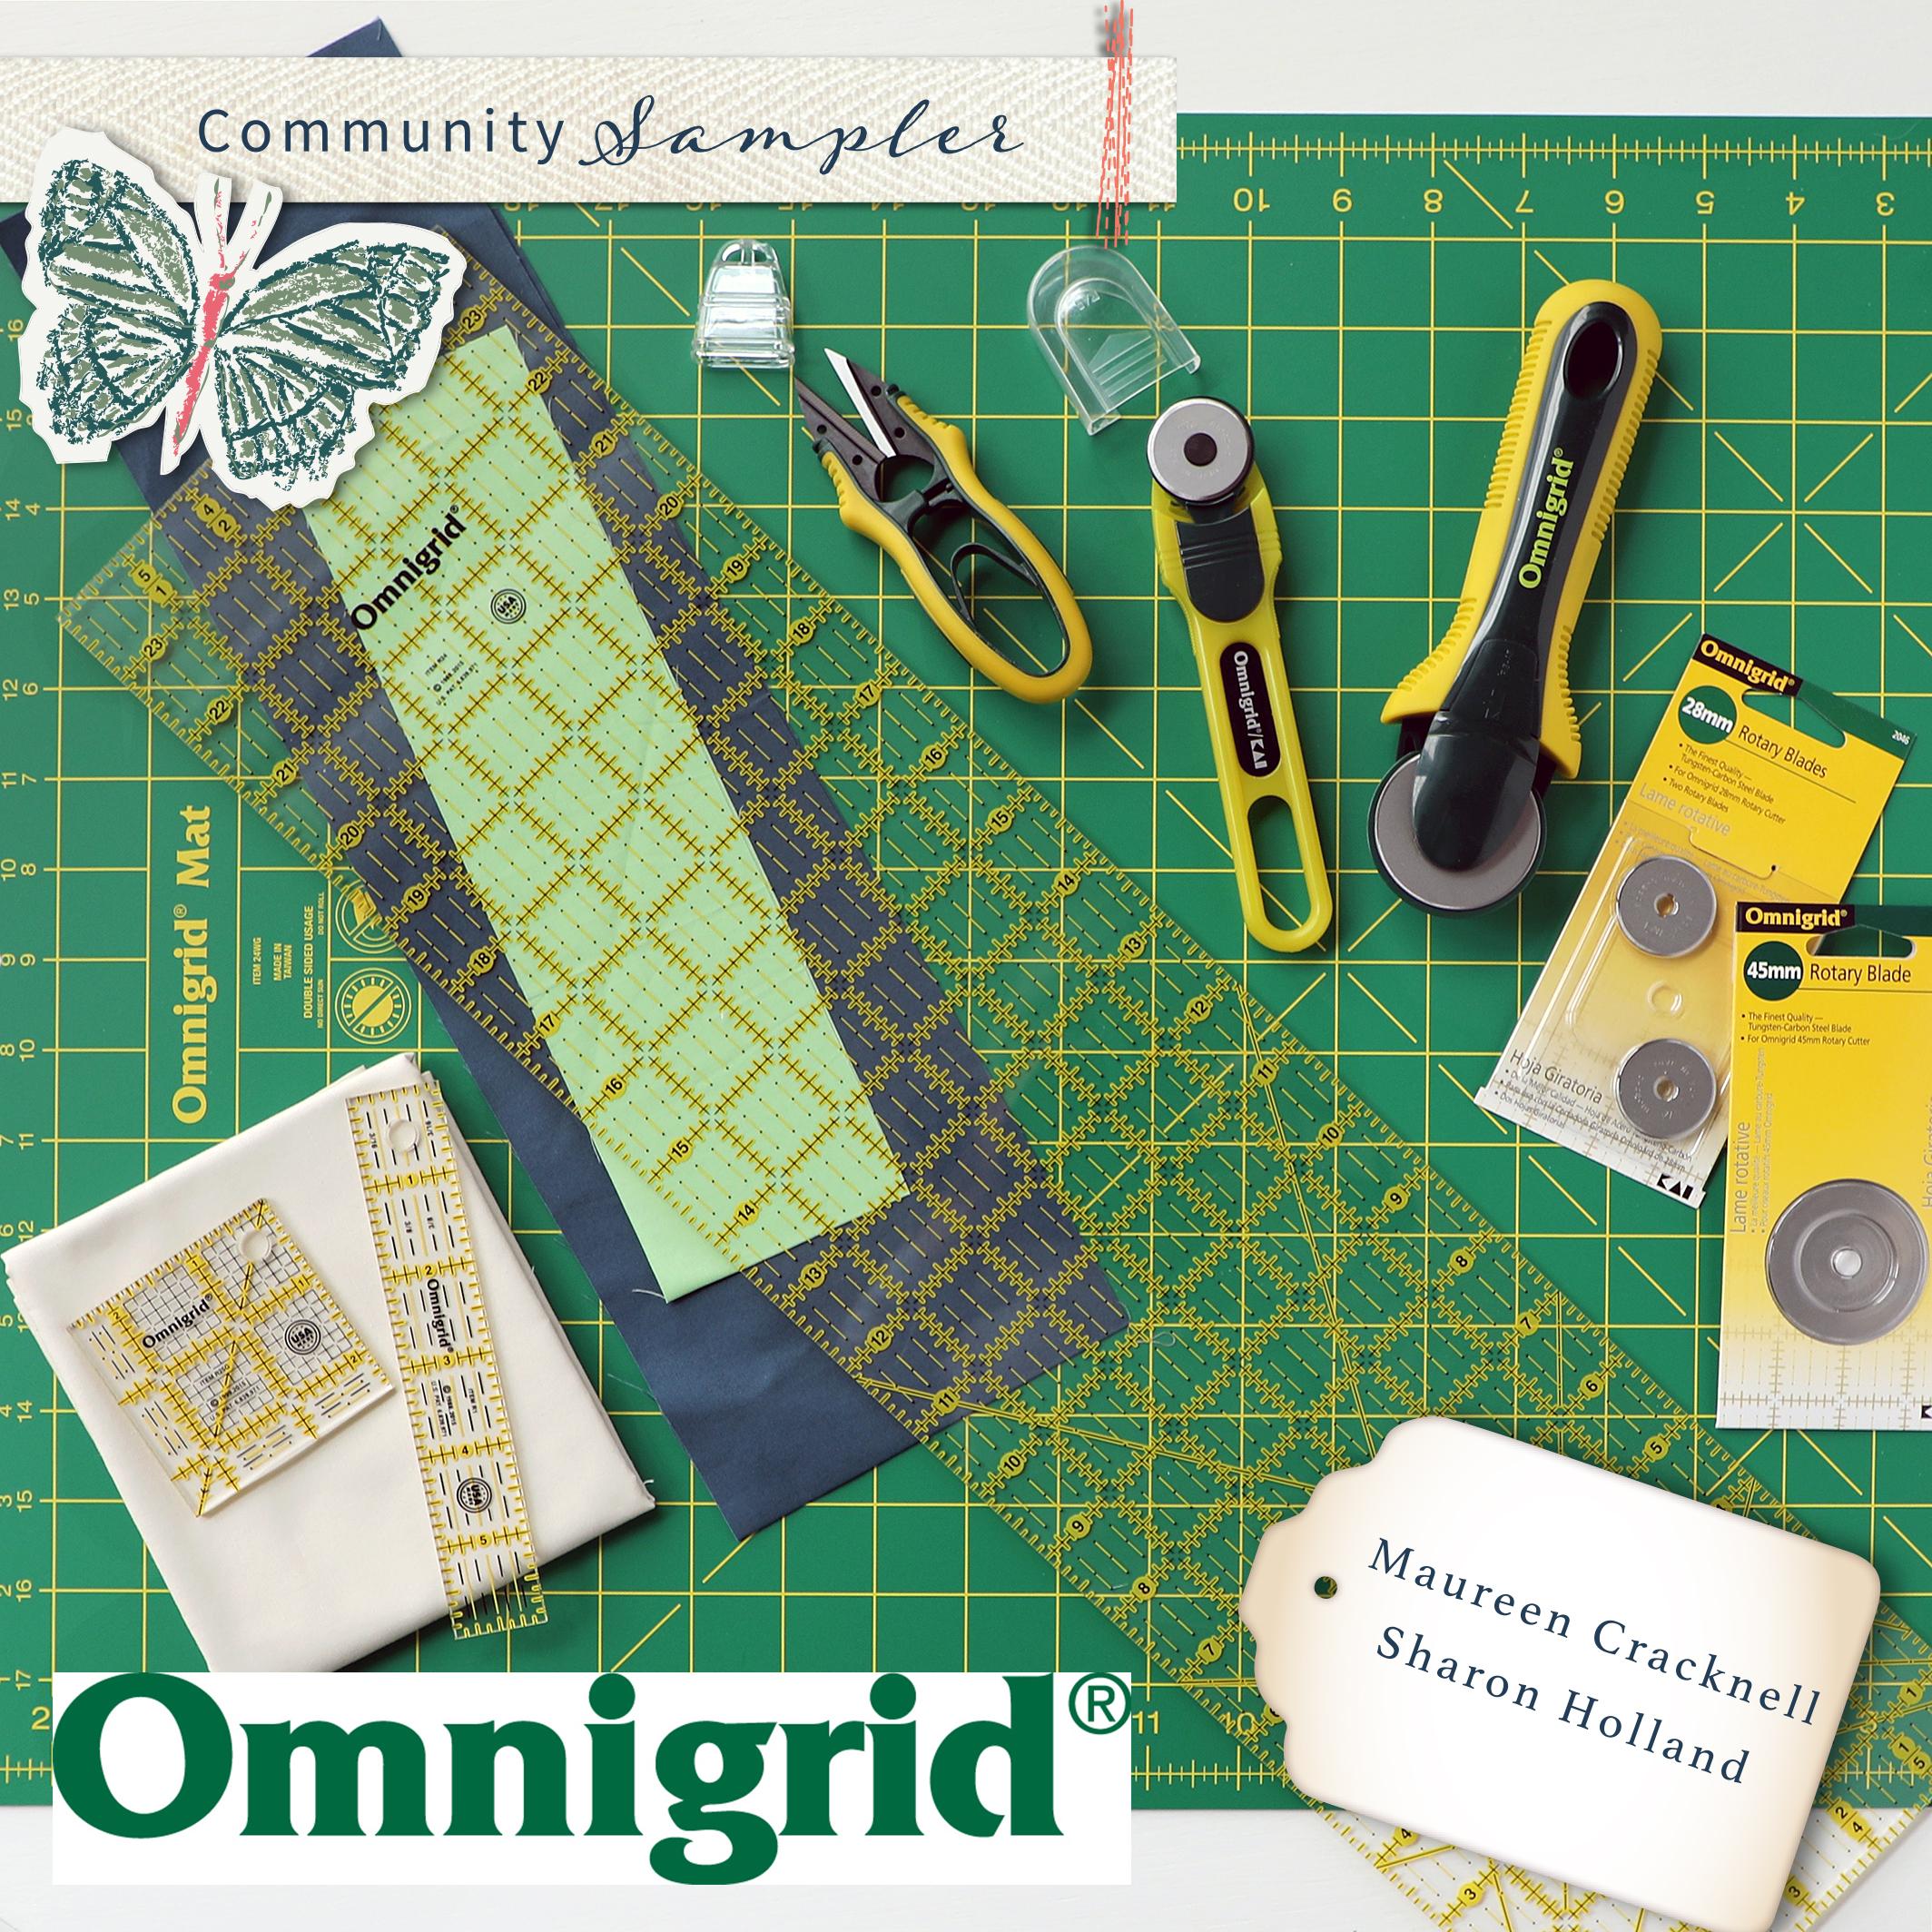 Community Sampler Omni Grid graphic.jpg